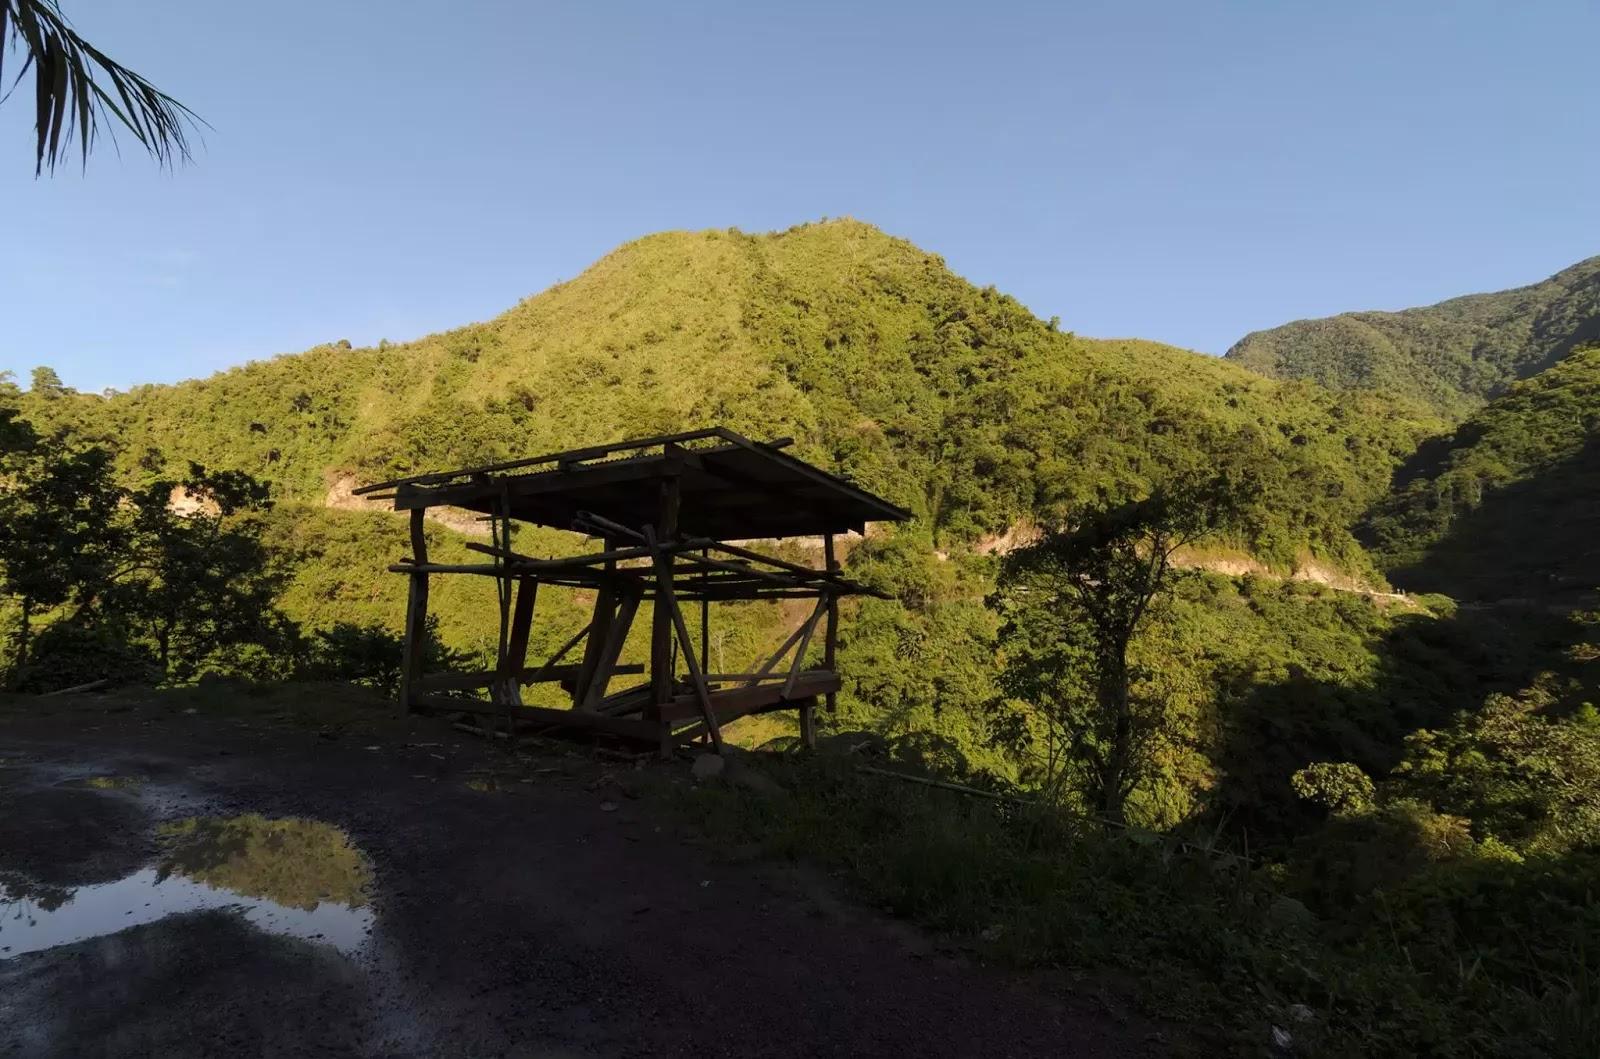 Bangaan Road Ifugao Cordillera Administrative Region Philippines